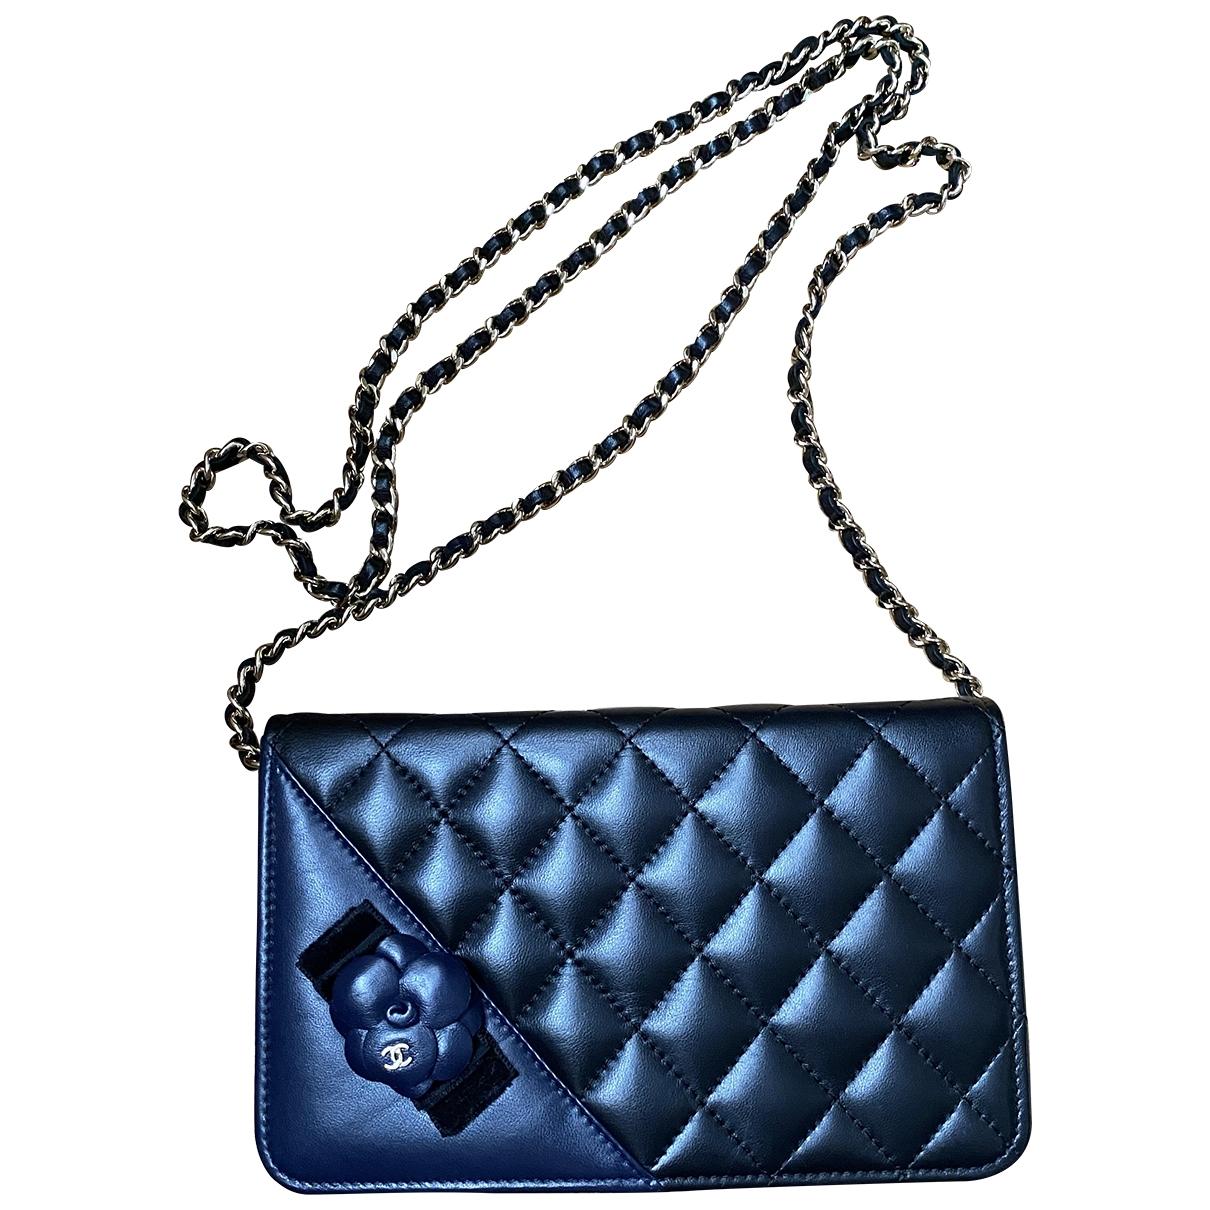 Chanel Wallet on Chain Black Leather handbag for Women \N